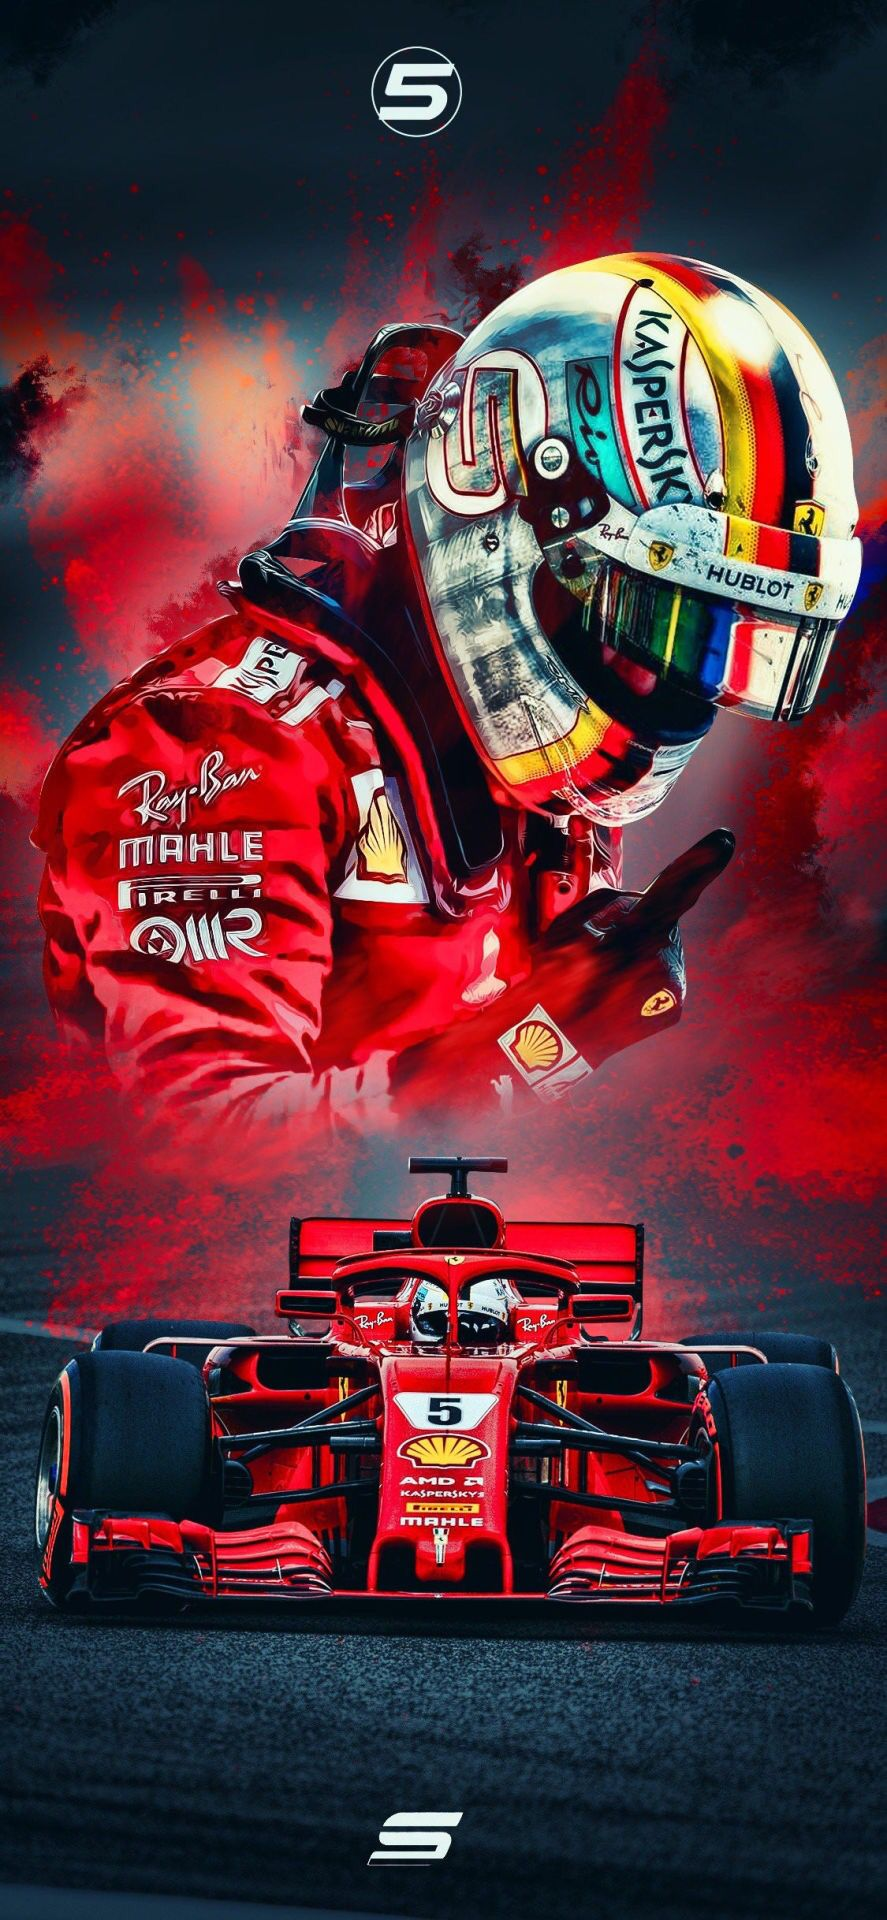 Sebastian Vettel wallpaper by SeviGraphics Formula 1 car